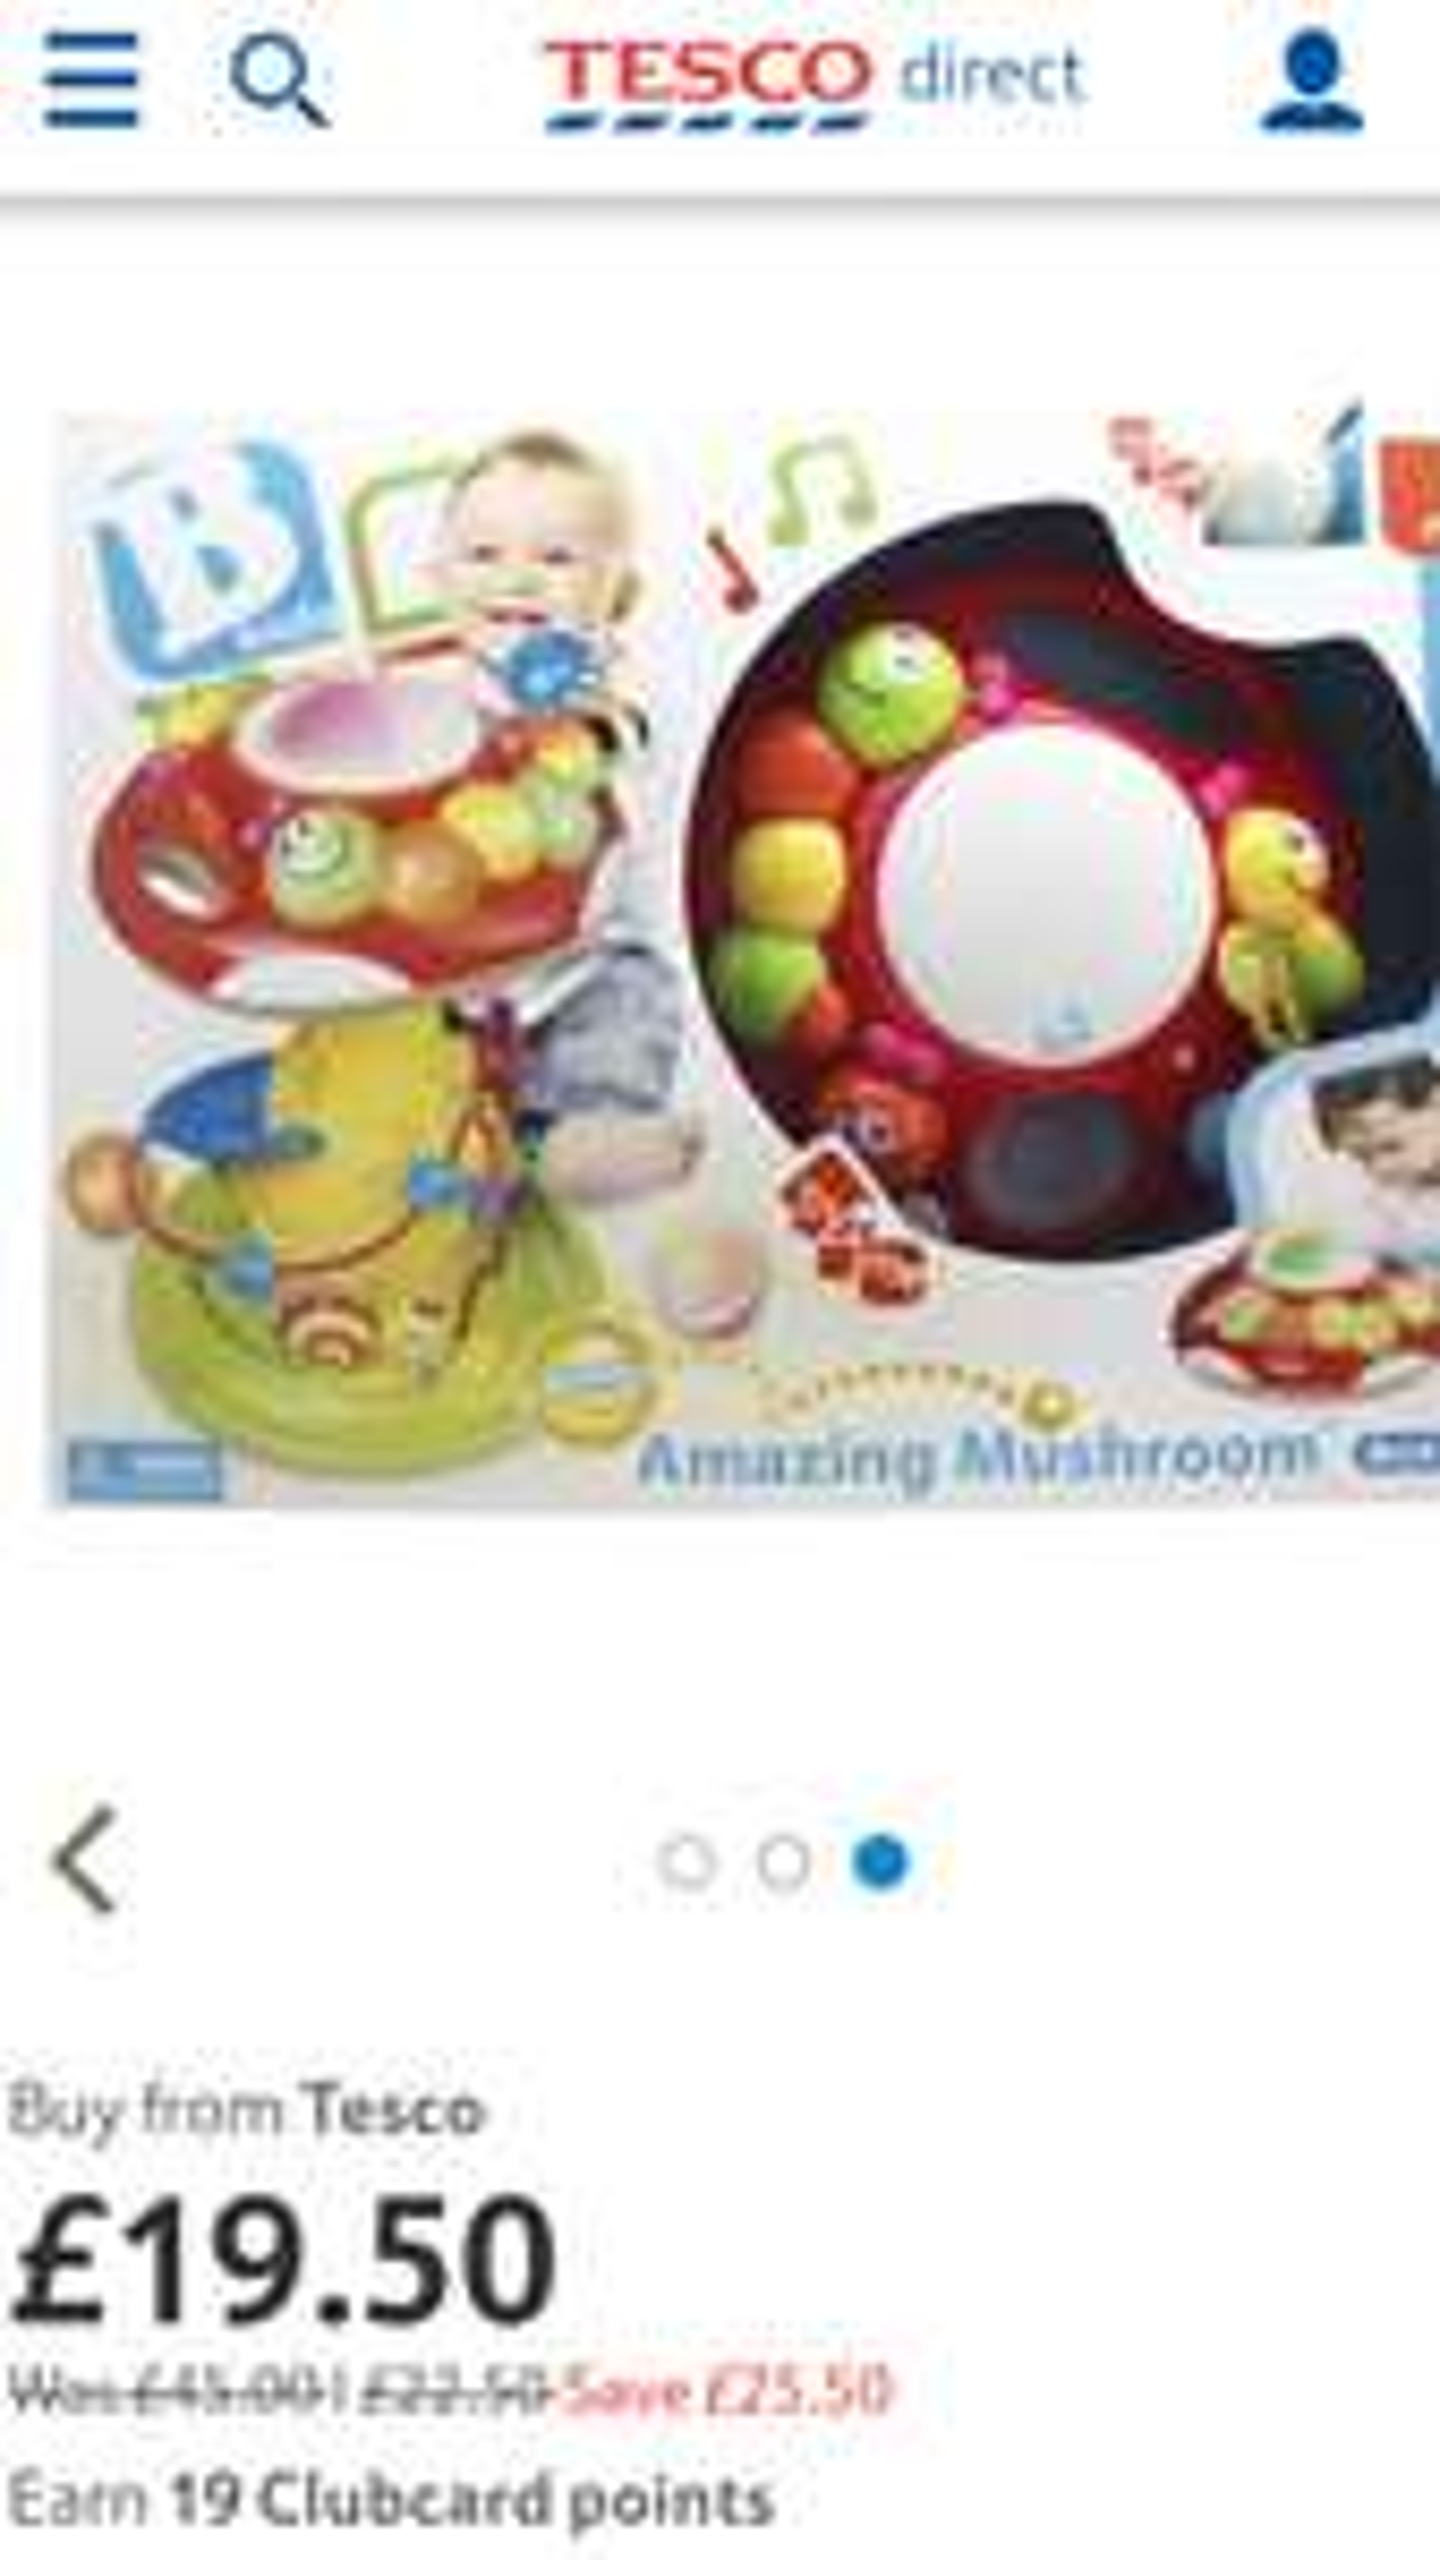 B Kids Rolling 'n Blinking Amazing Mushroom - £19.50 -Tesco Free C&C